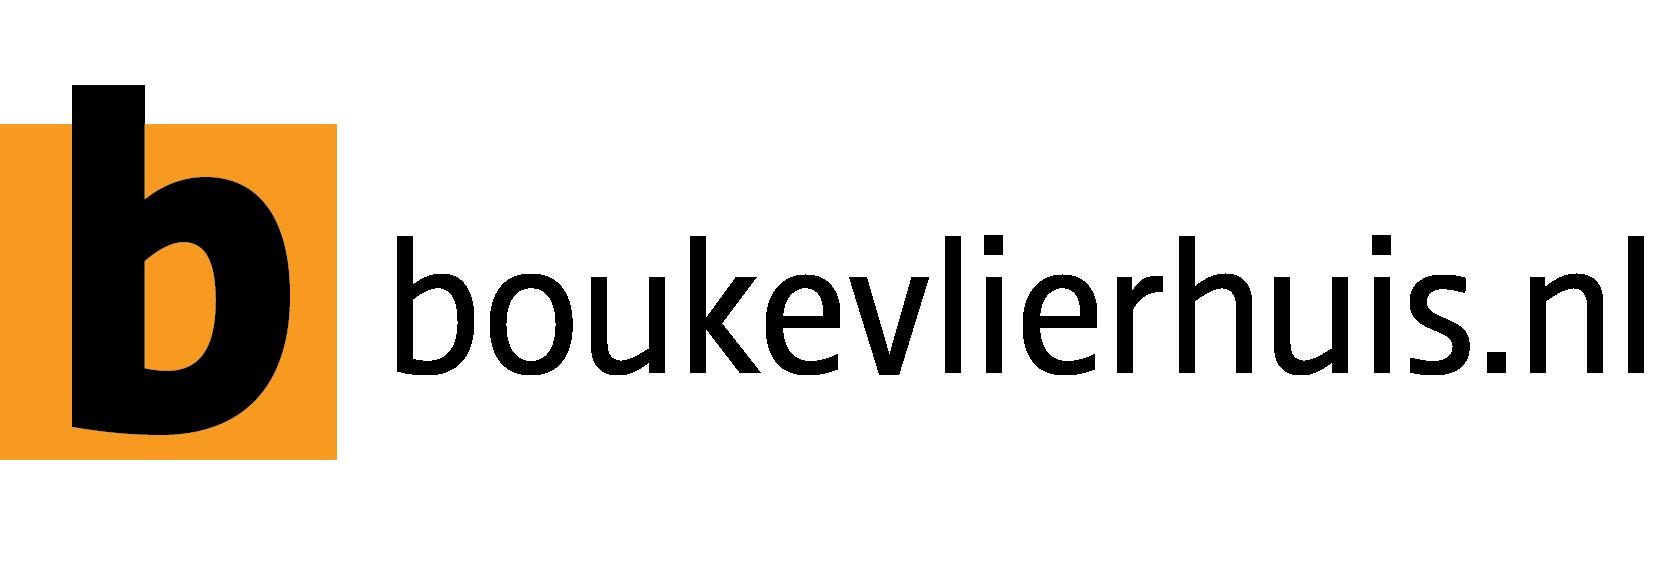 Boukevlierhuis